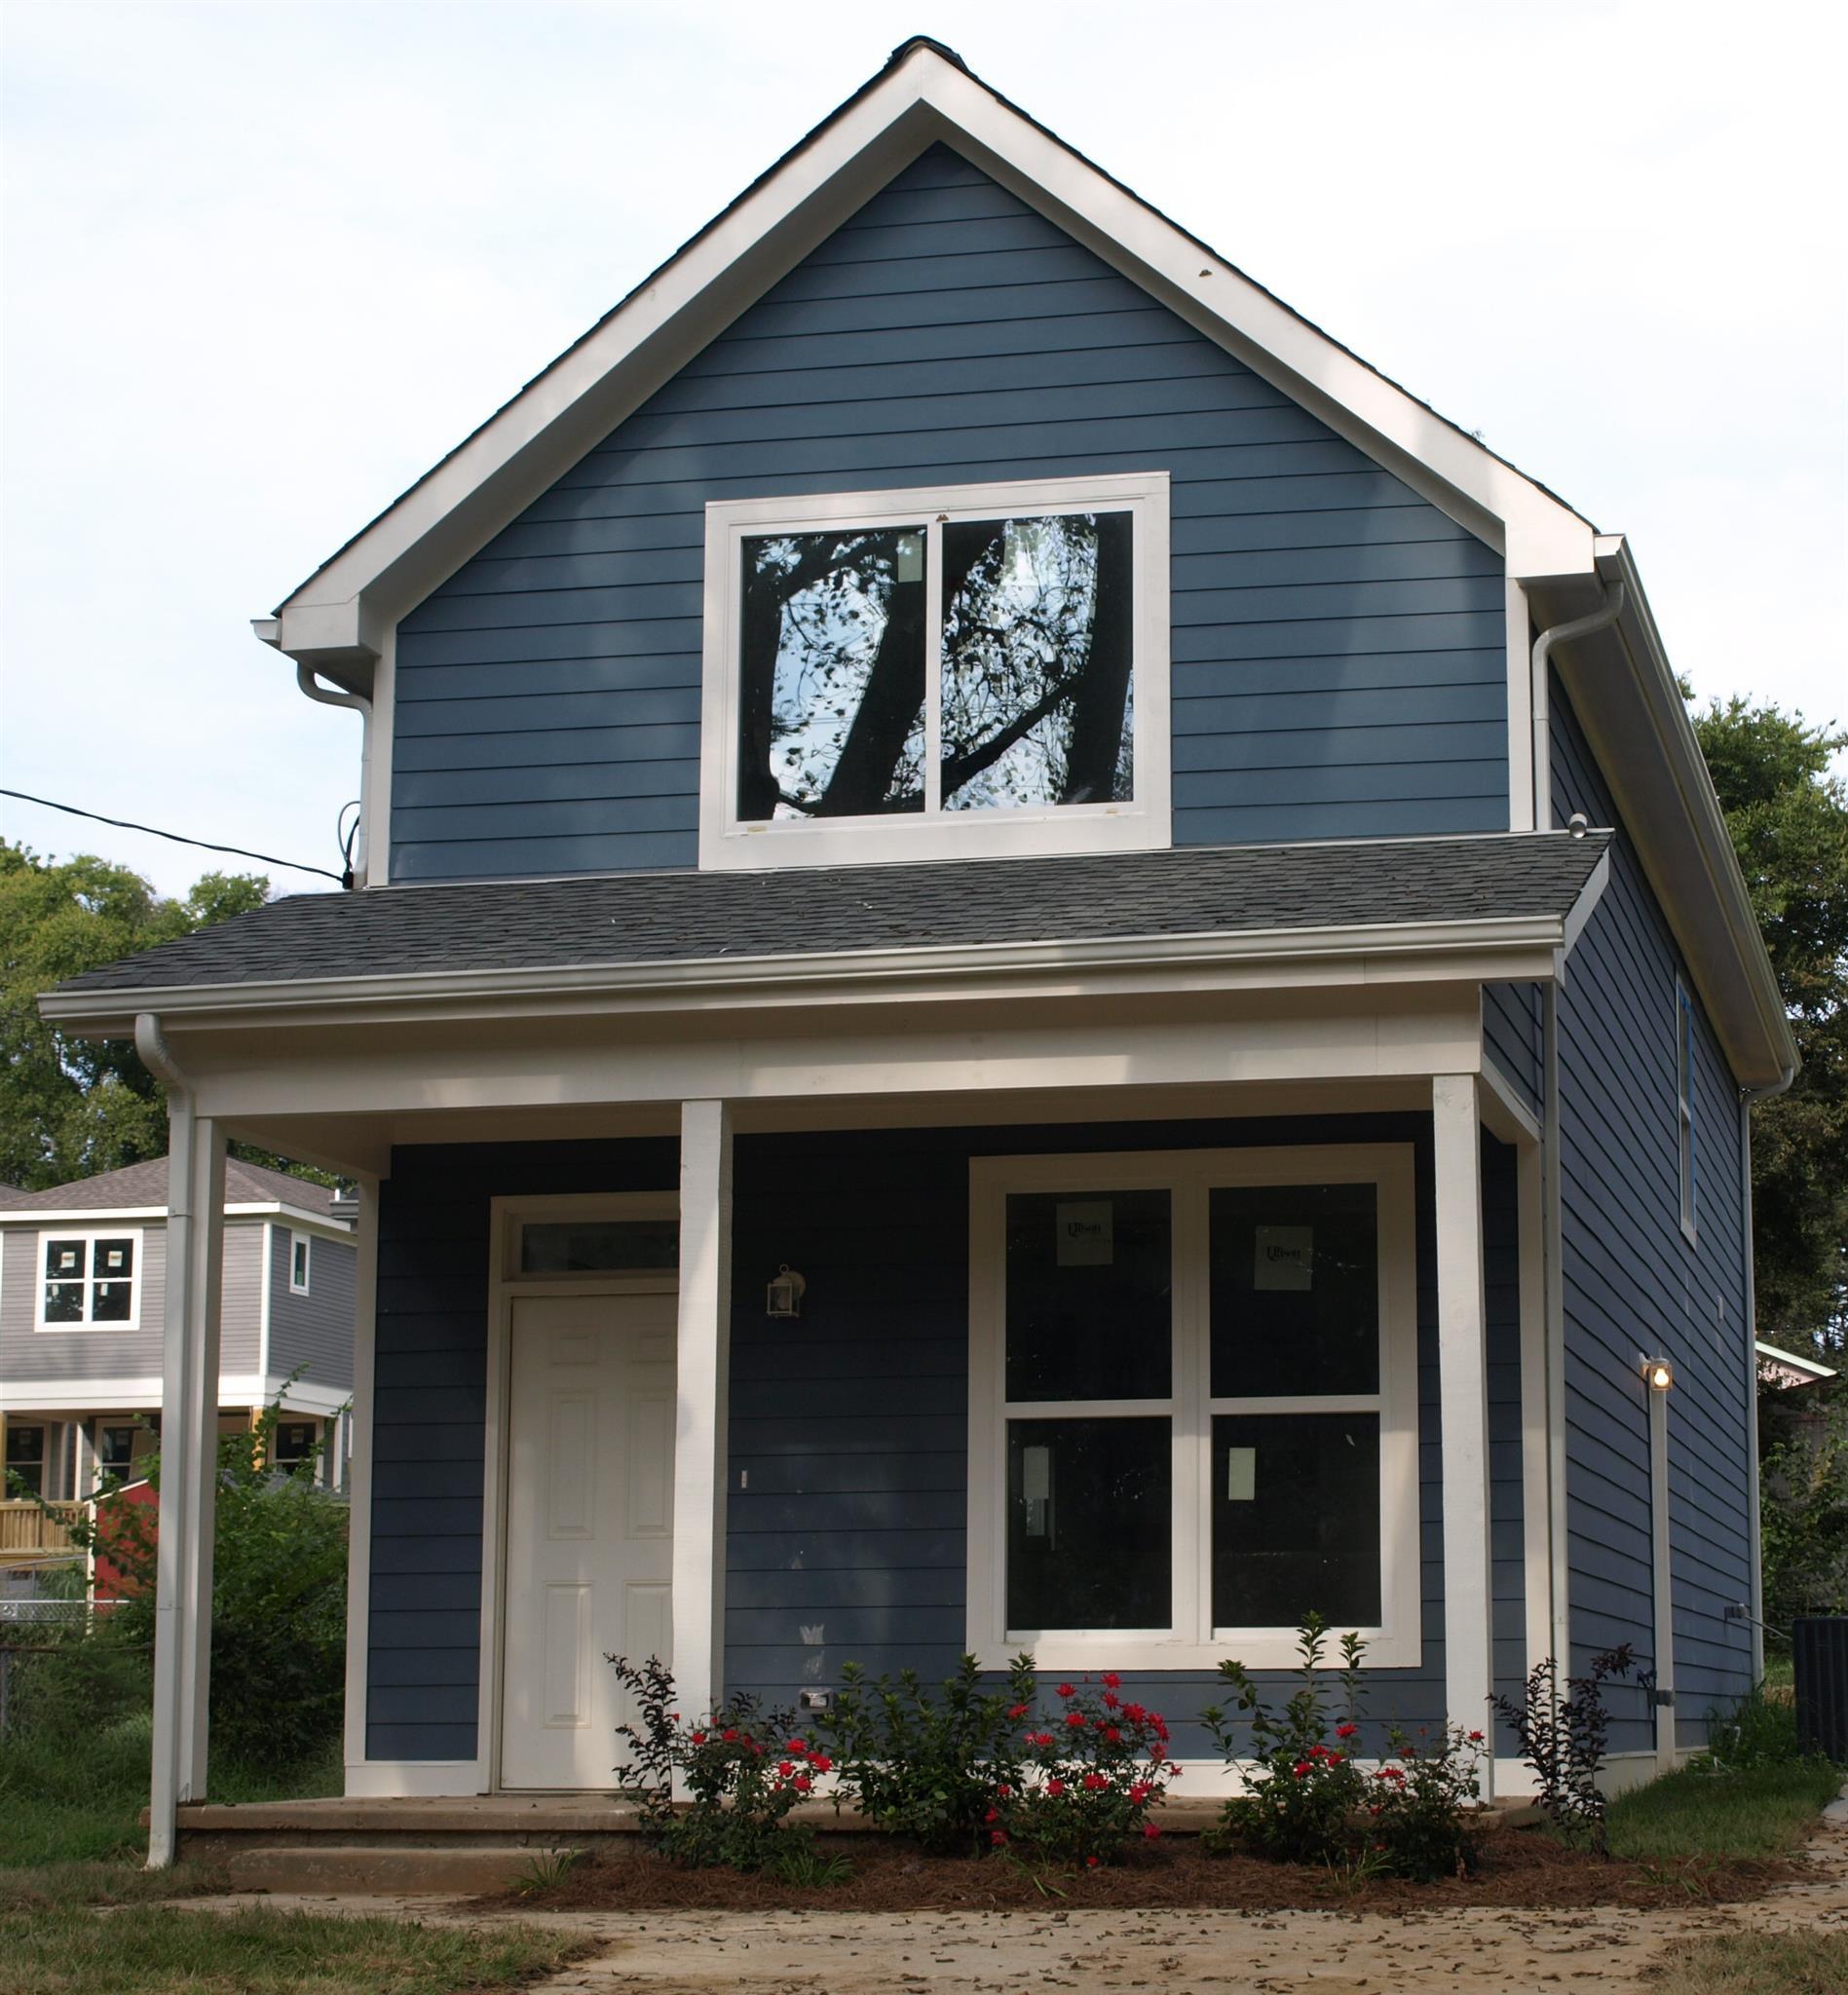 1822 Cephas St, Nashville, TN 37208